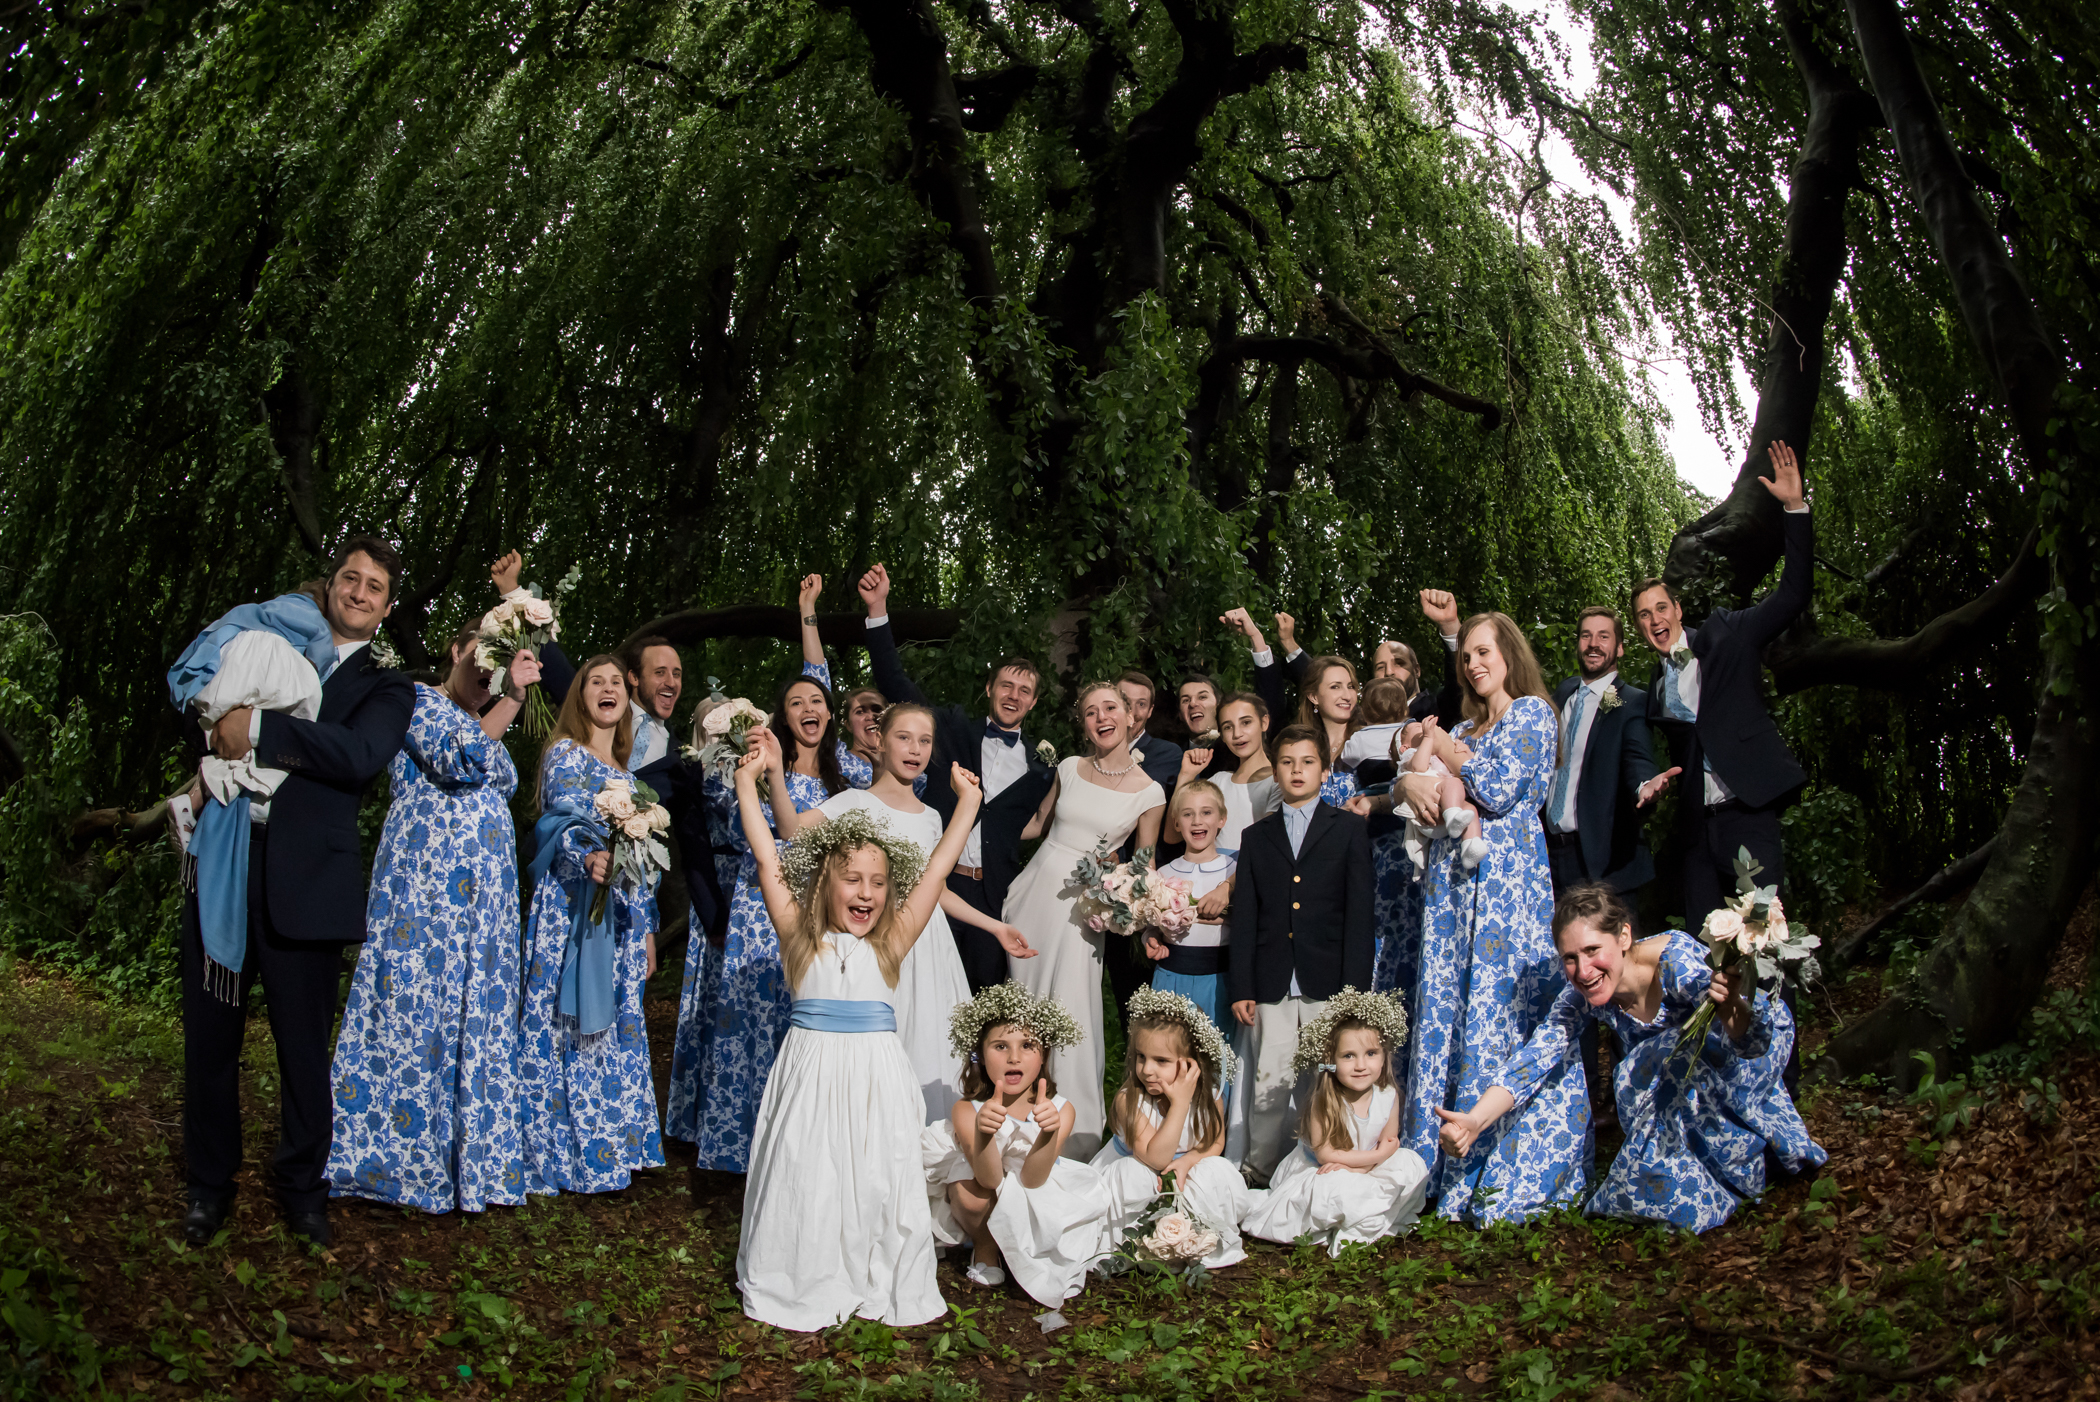 Stefy Hilmer Photography-wedding party group photo.jpg